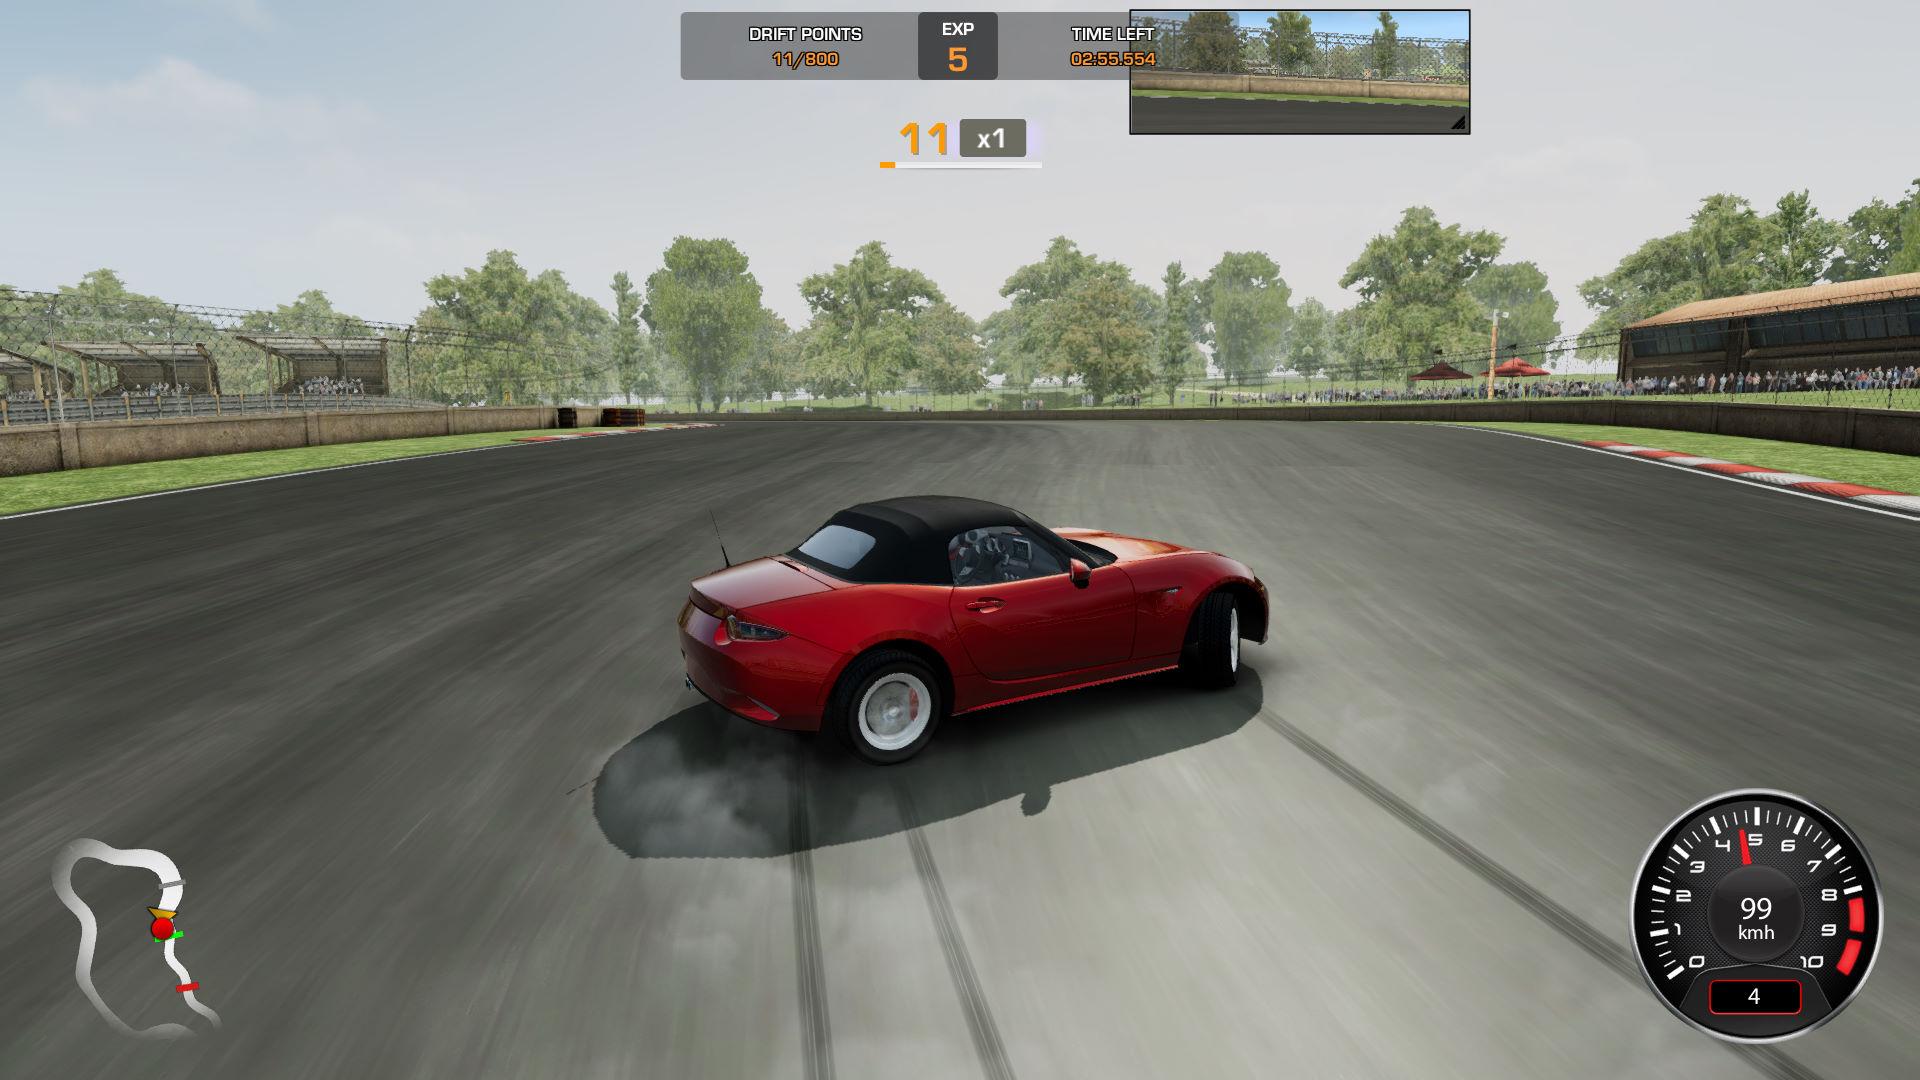 Ferrari virtual race drift mod 2 скачать торрент бесплатно на.